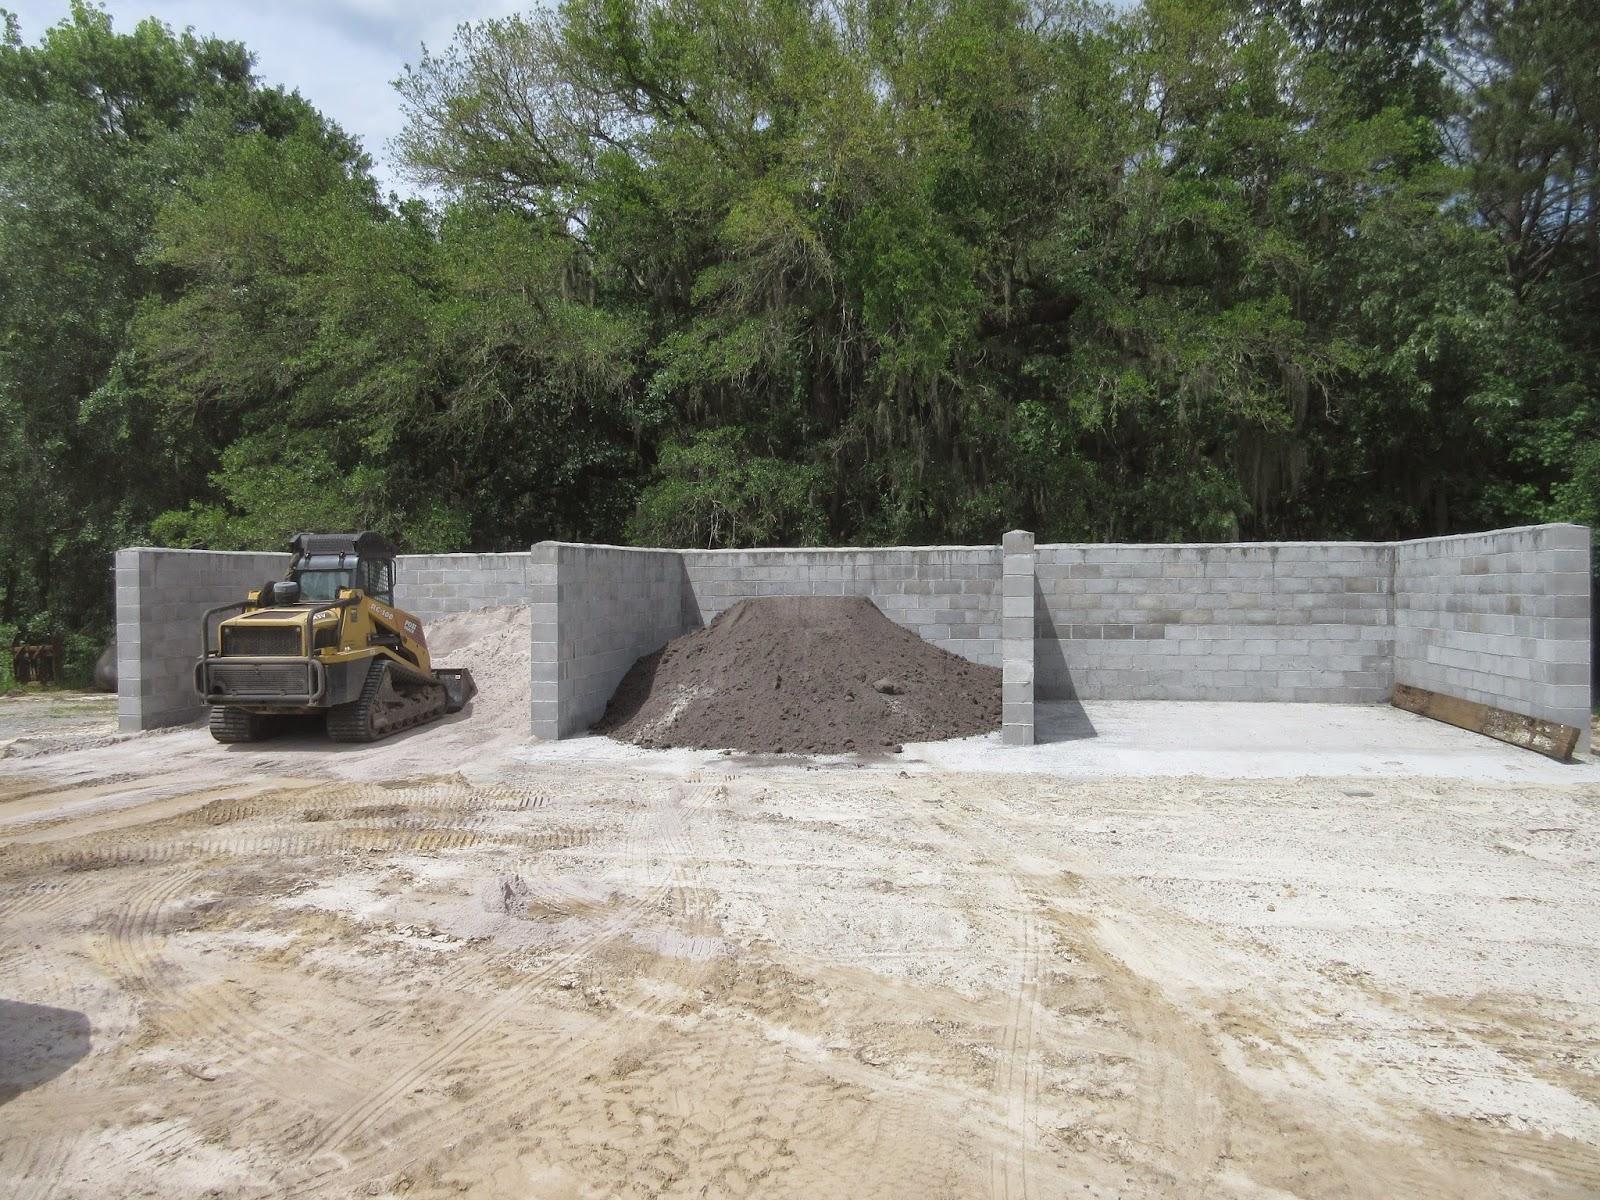 Material Storage Bins & Brays Island Plantation Greens Renovation: Material Storage Bins